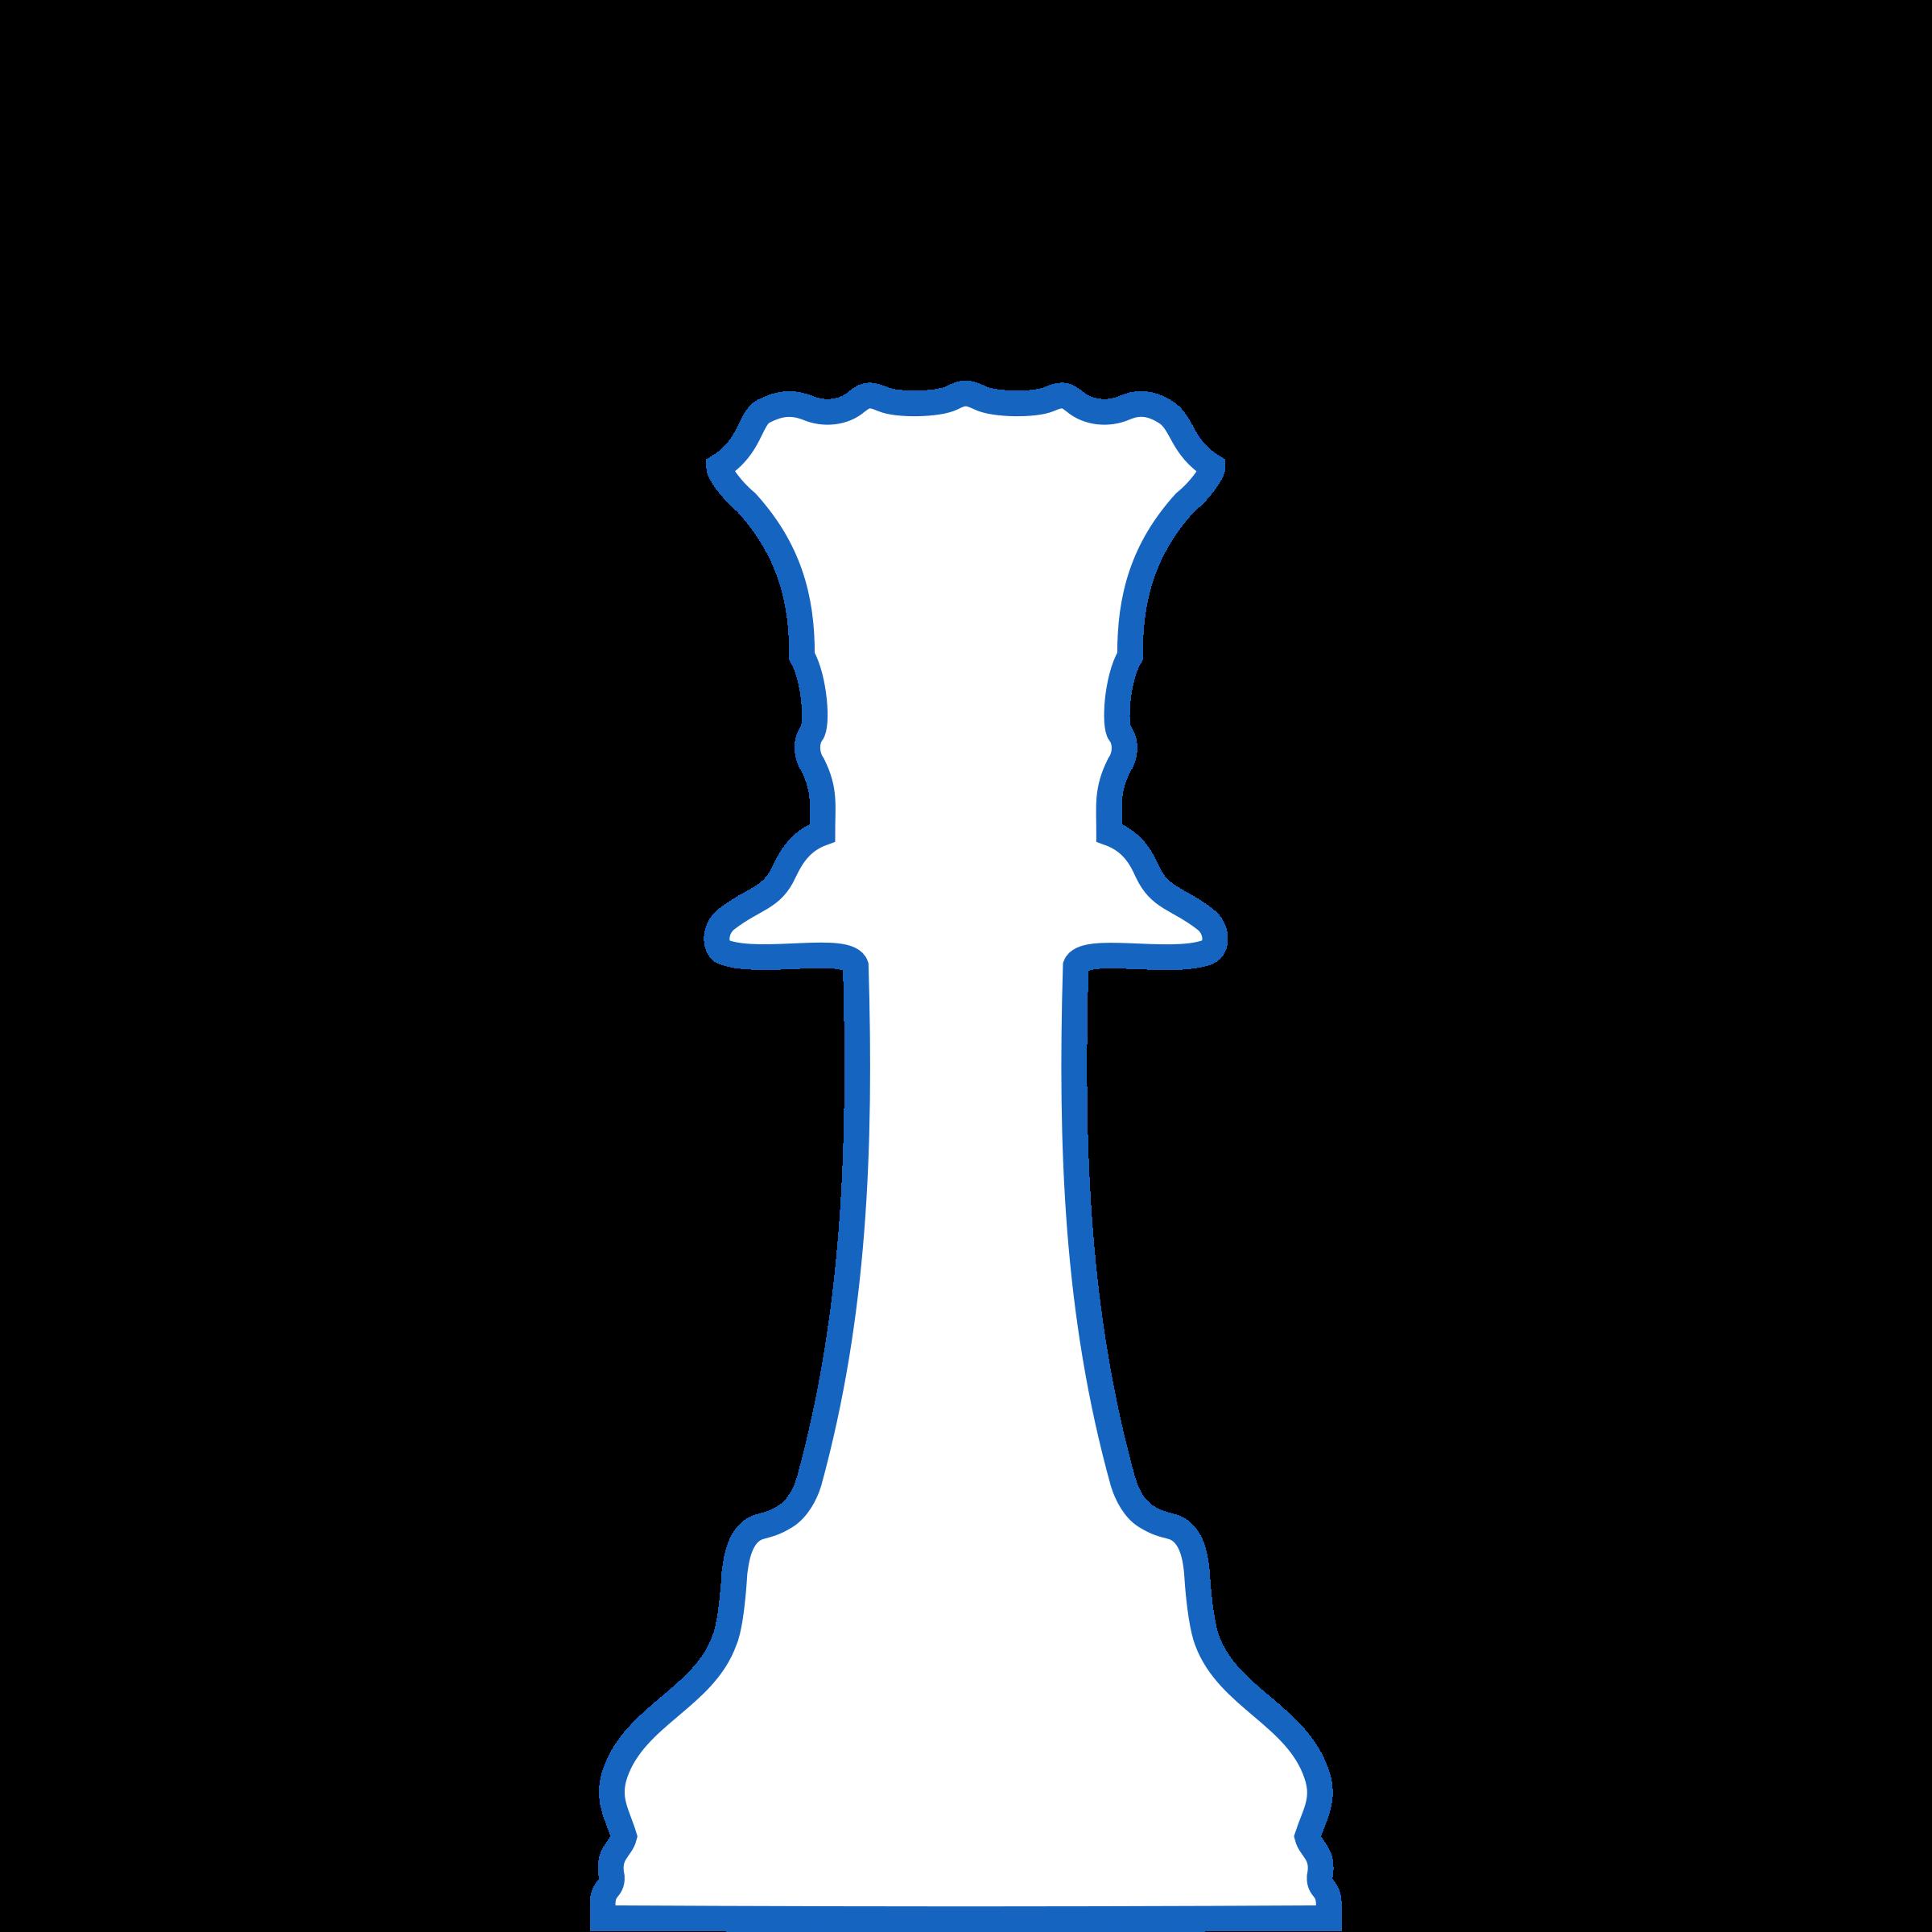 Queen clipart silhouette. White staunton chess piece